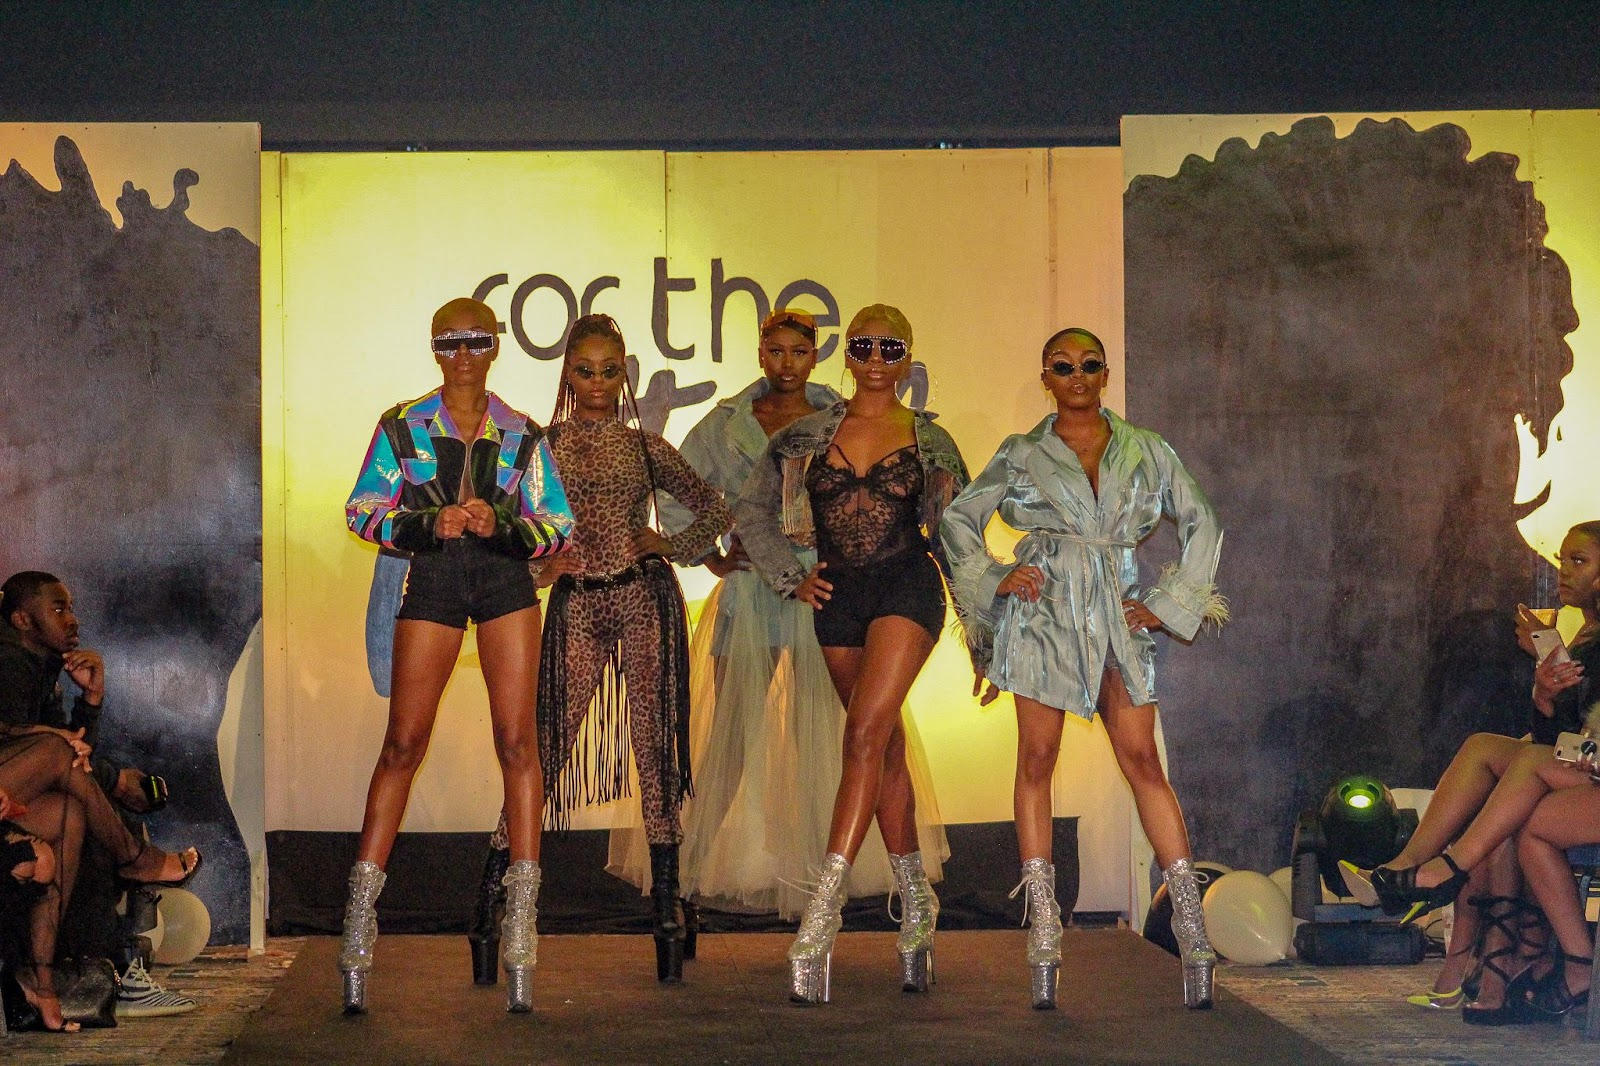 /Users/whitneybronson/Desktop/Fashion Show/Fashion Show Edited/IMG_2856-2.jpg